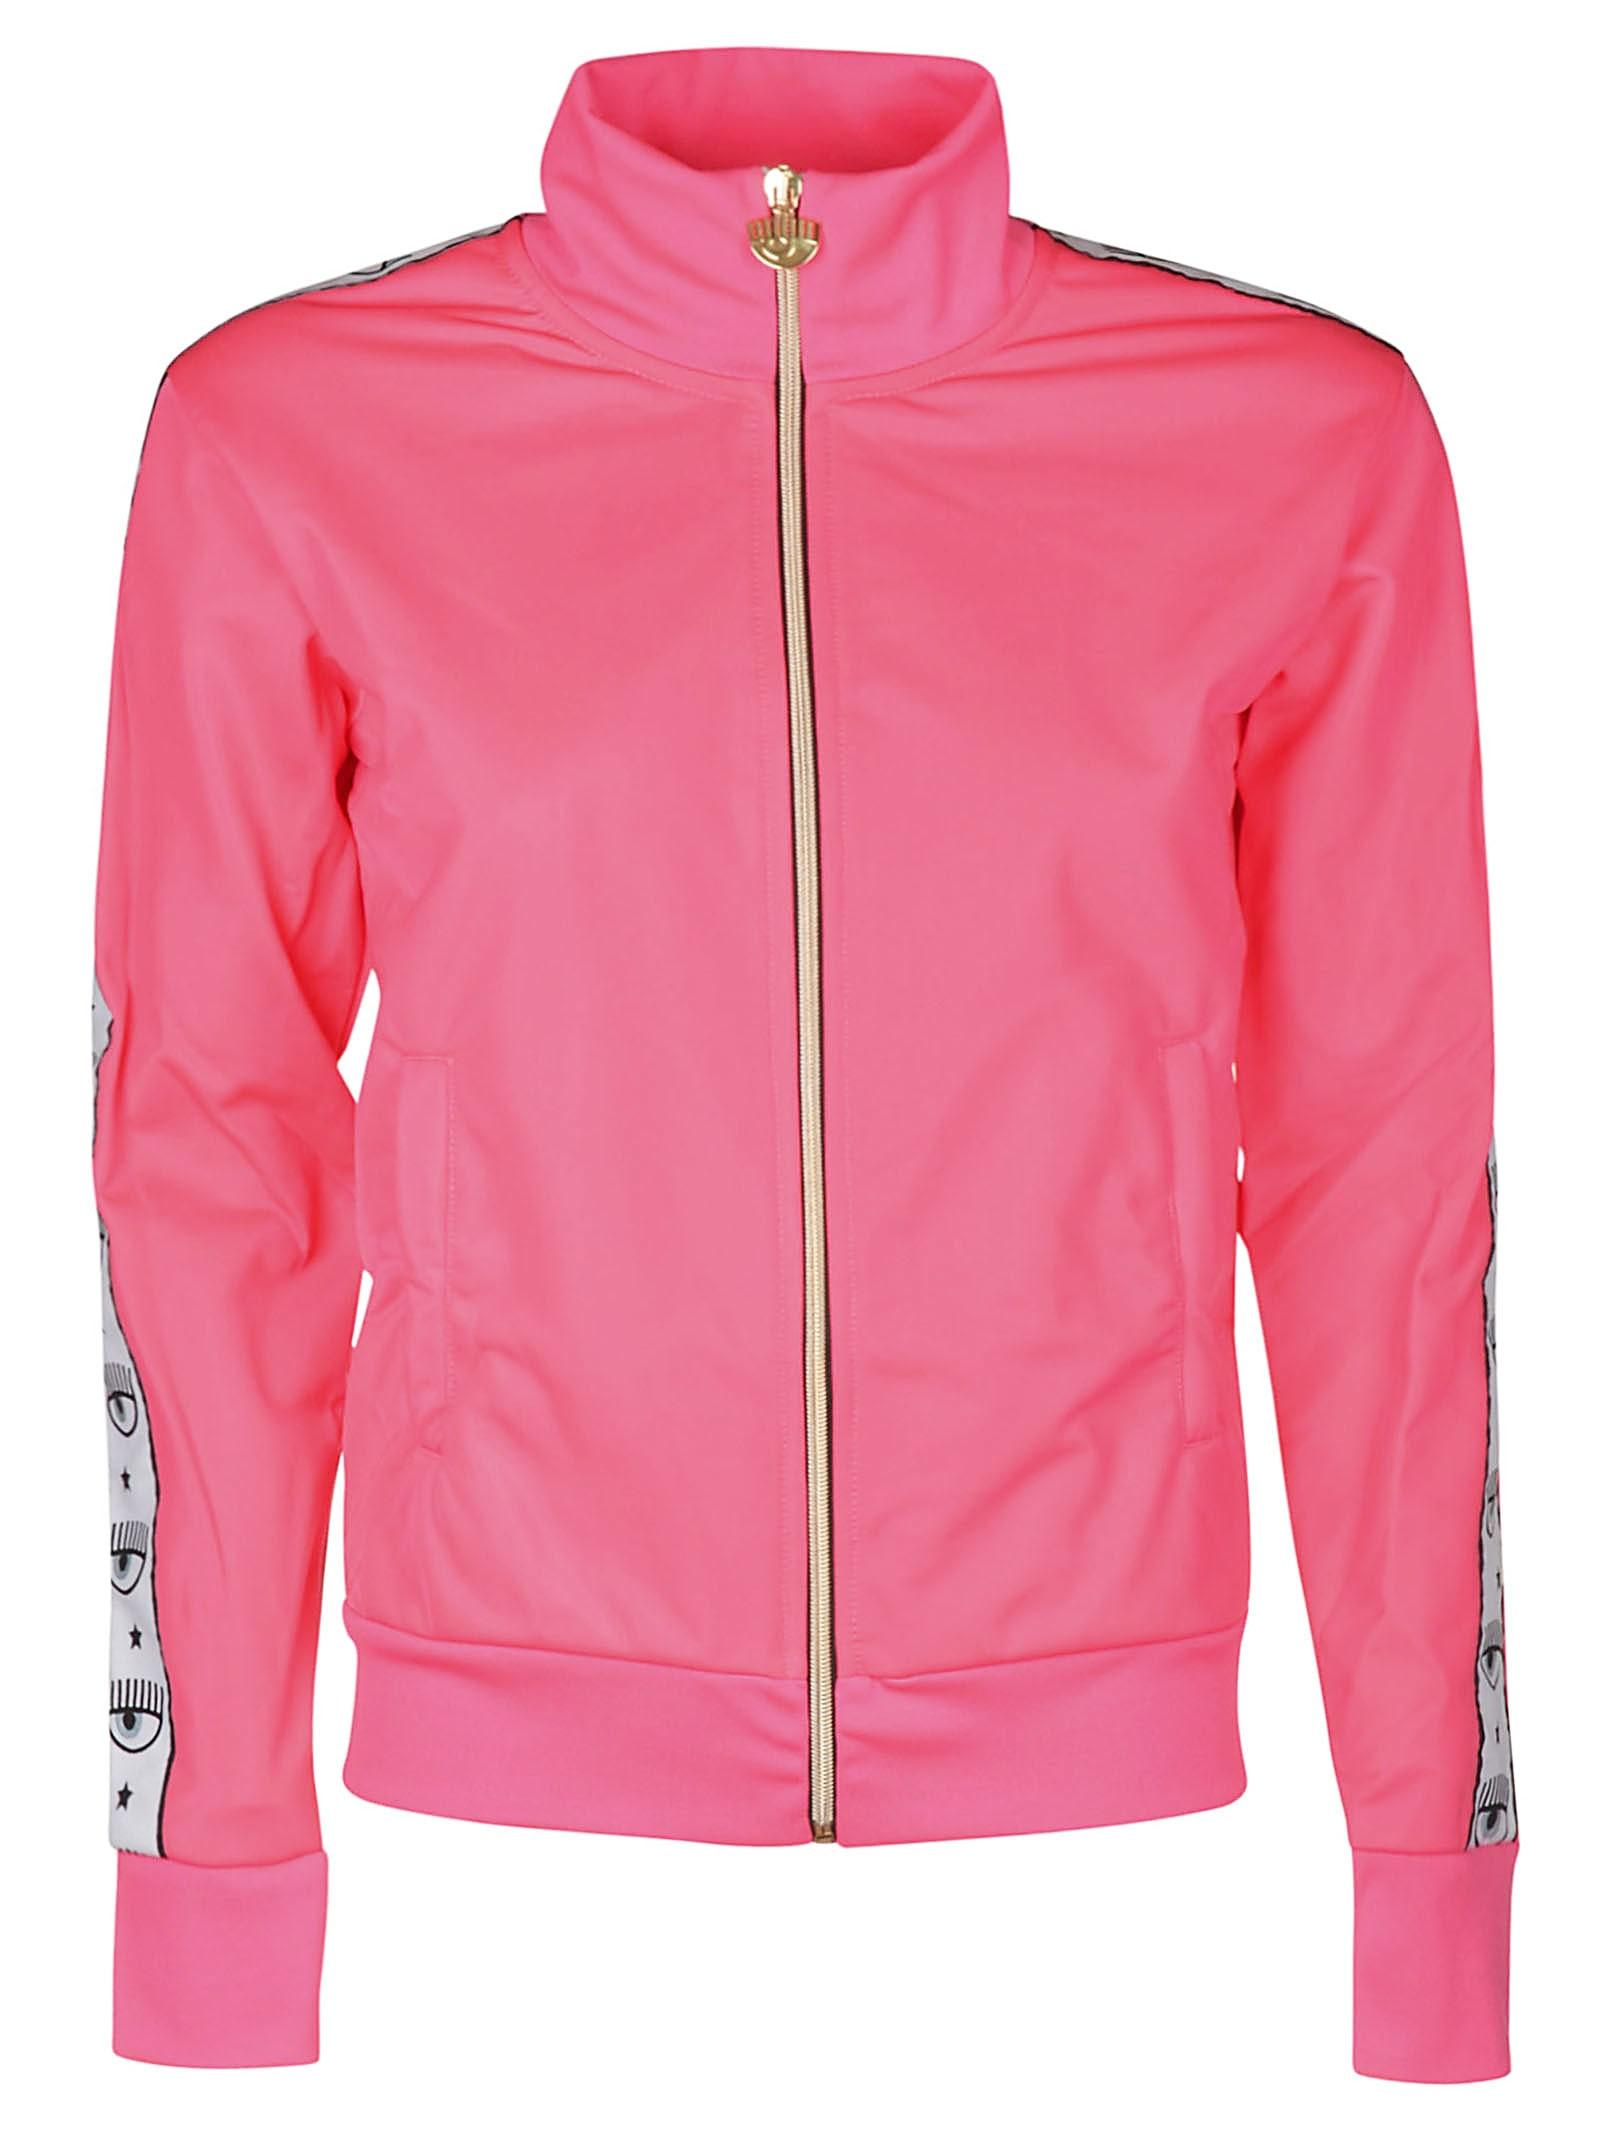 Chiara Ferragni Zipped Jacket